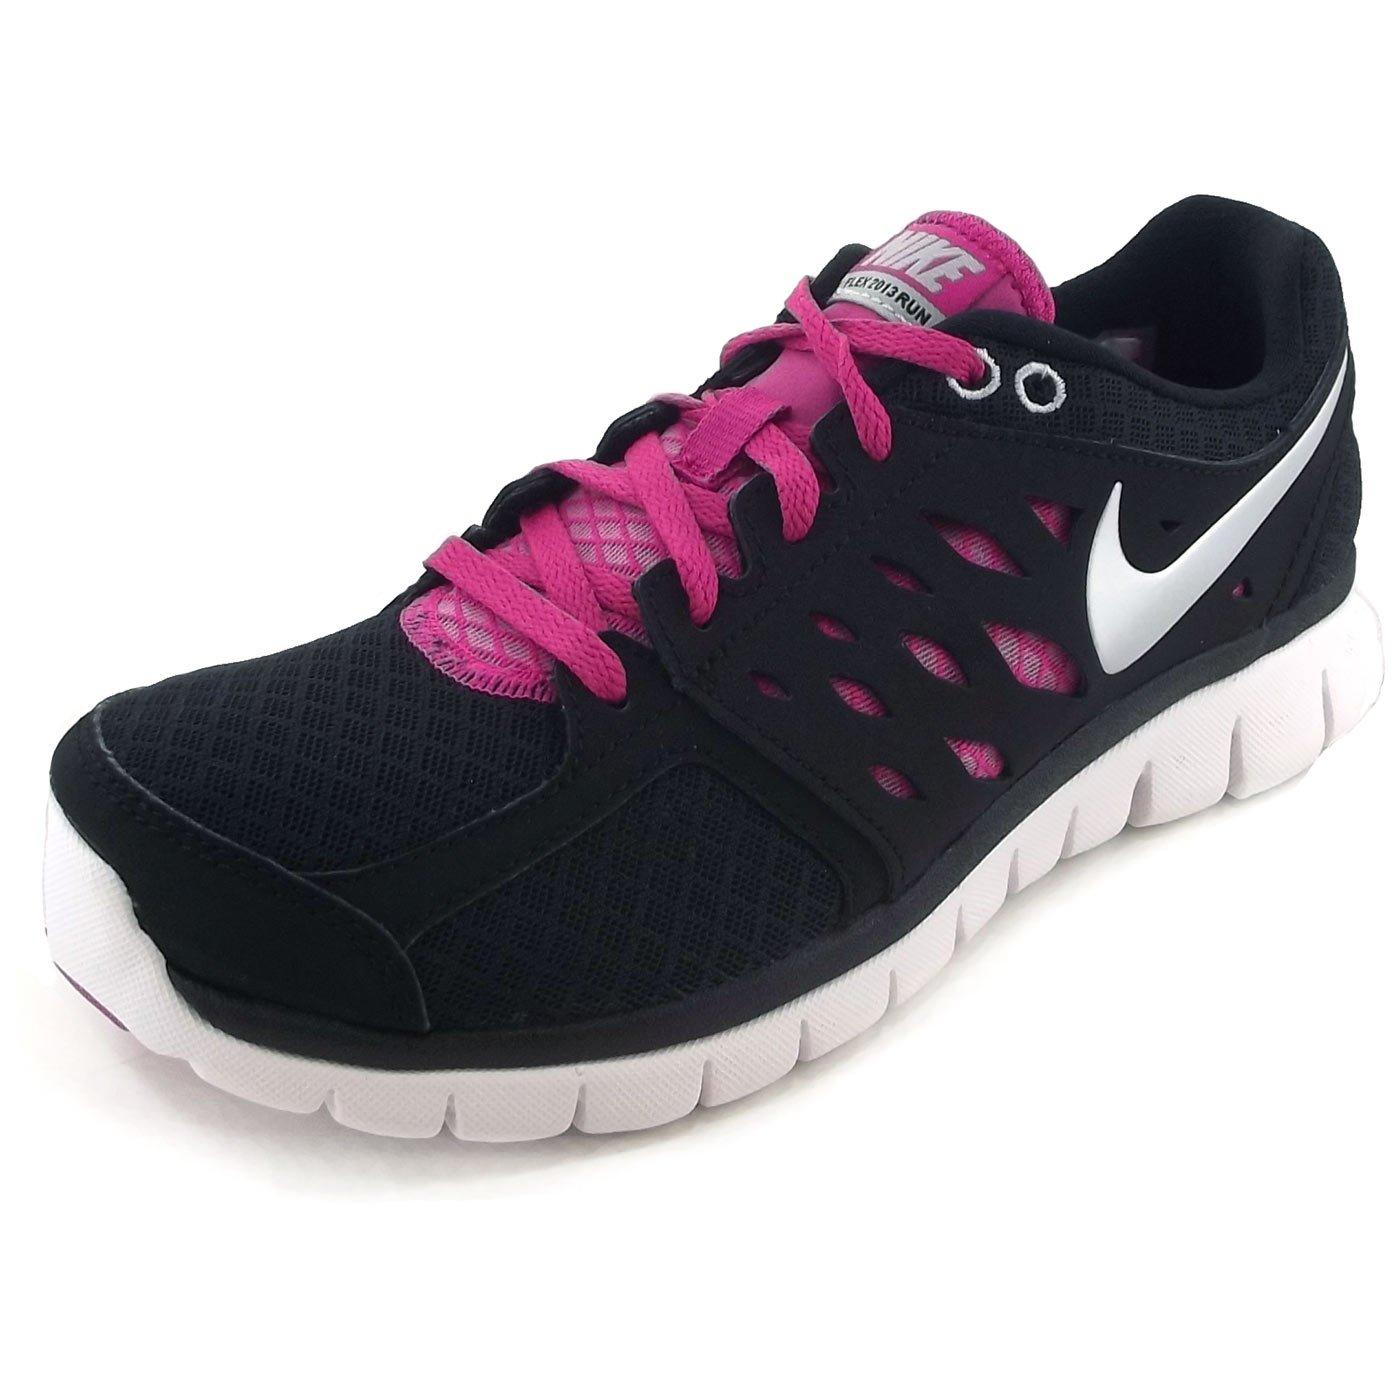 Nike Flex 2013 Run 580440 Damen Sneaker, schwarzweißpink